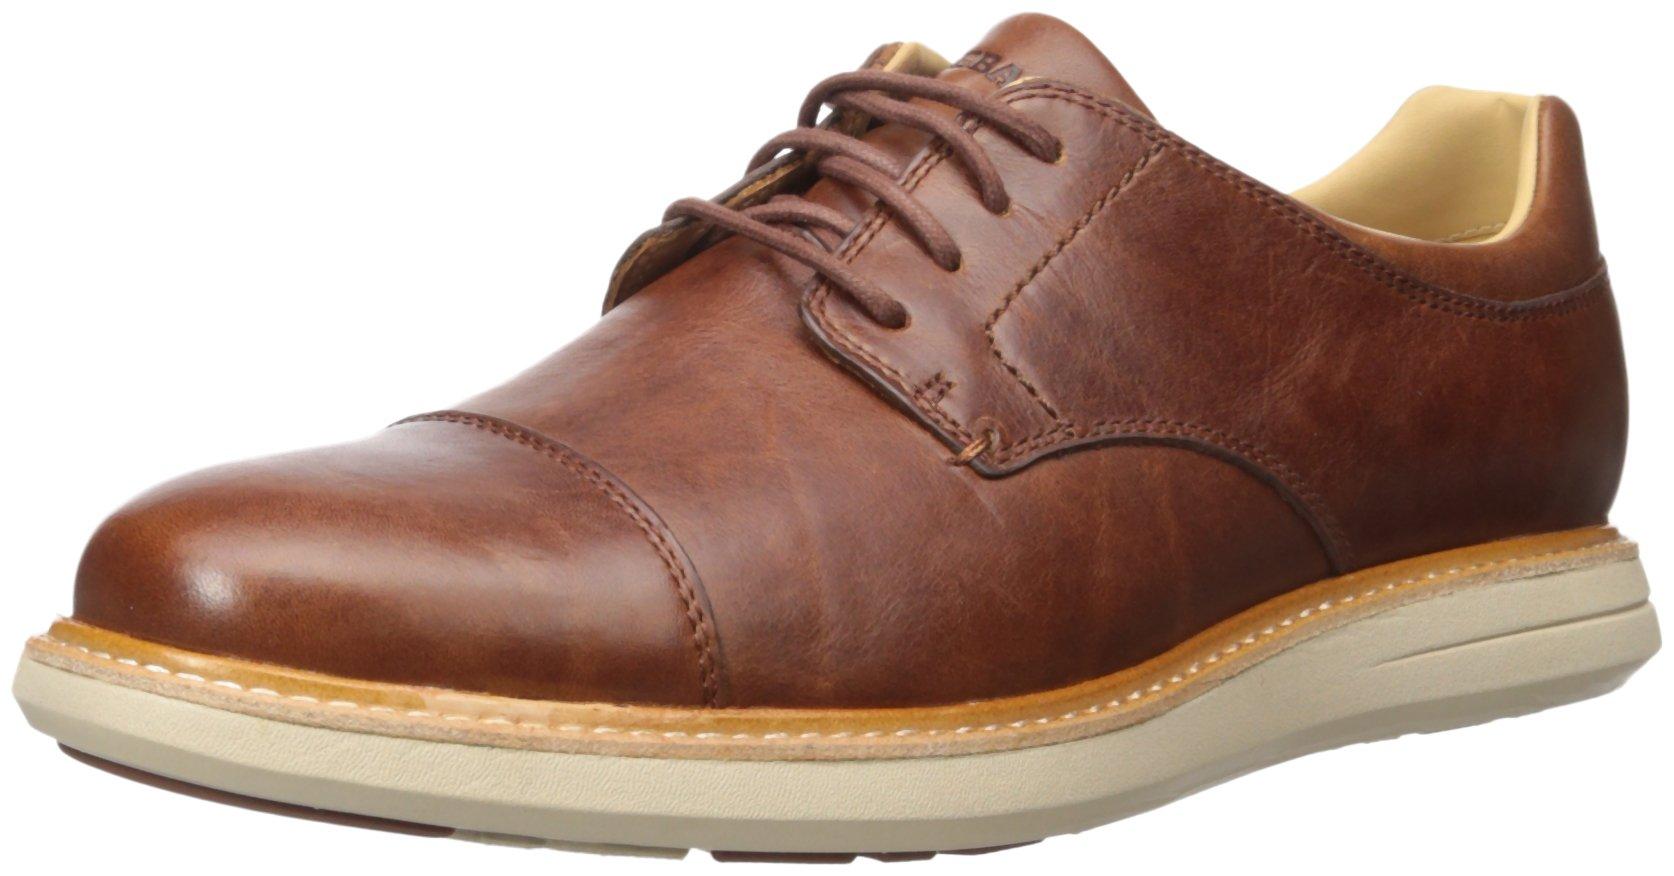 Sebago Men's Smyth Cap Toe Oxford, Brown Leather, 8 M US